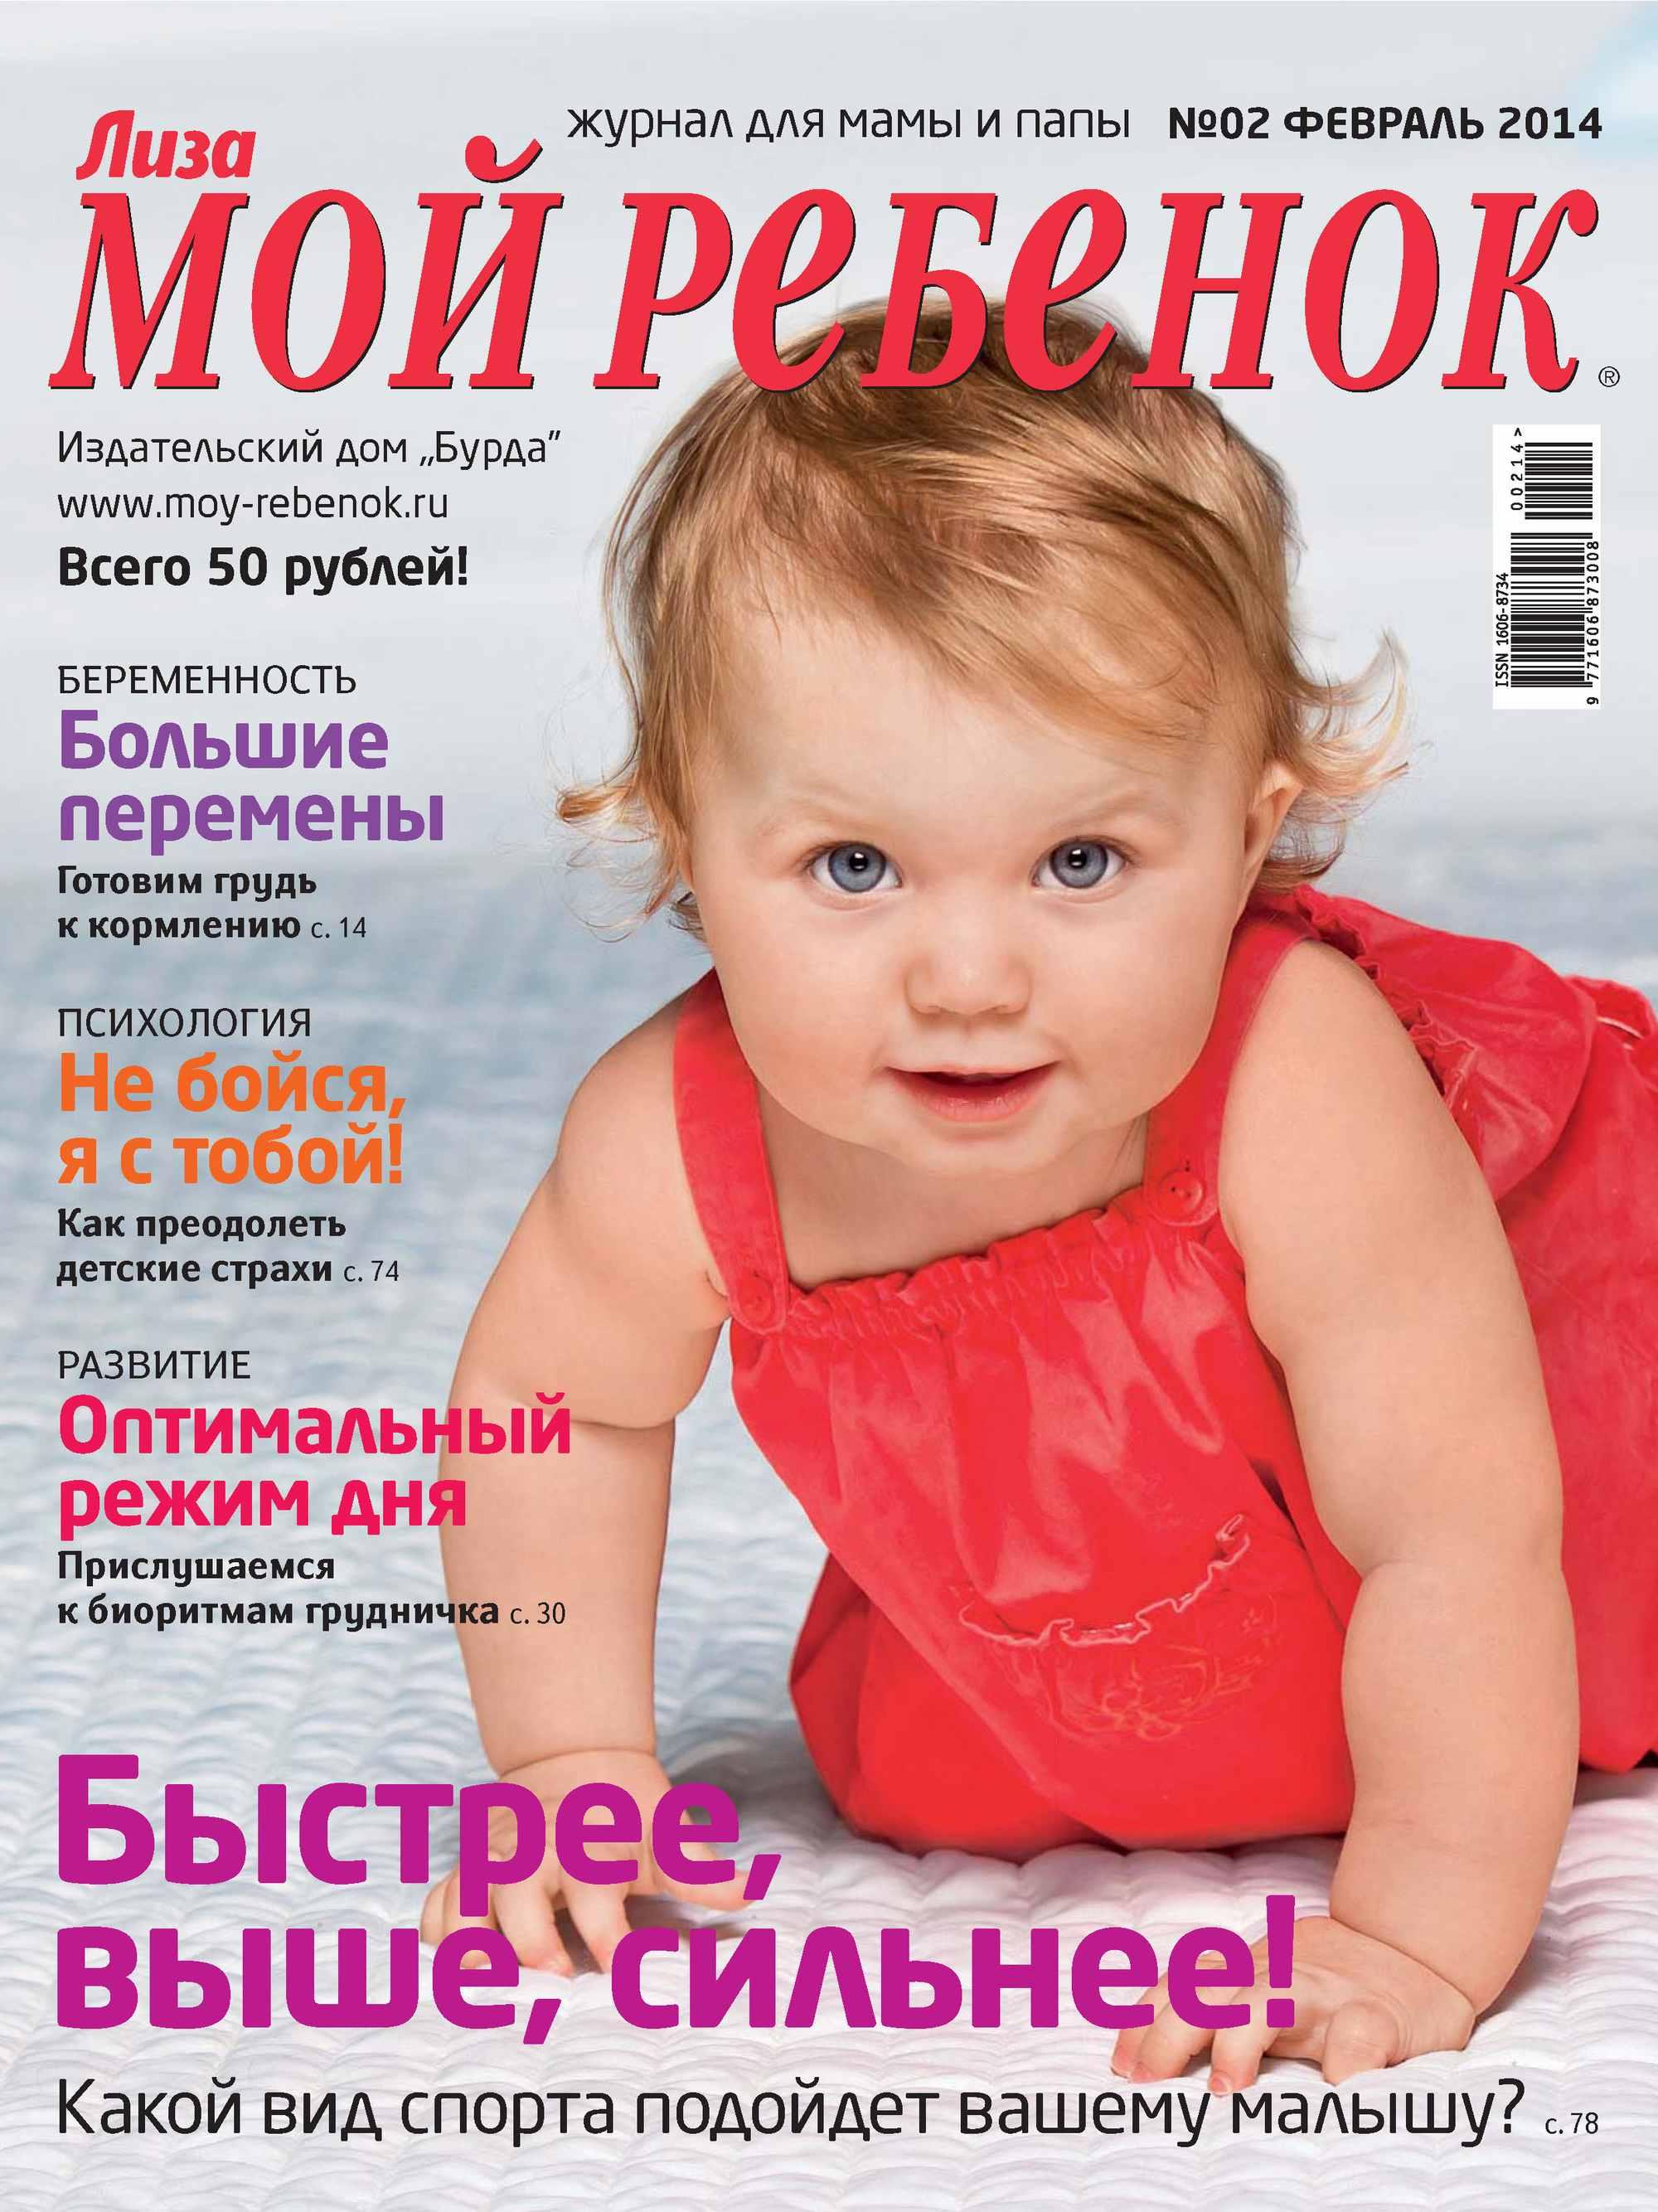 ИД «Бурда» Журнал «Лиза. Мой ребенок» №02/2014 ид бурда журнал лиза мой ребенок 03 2014